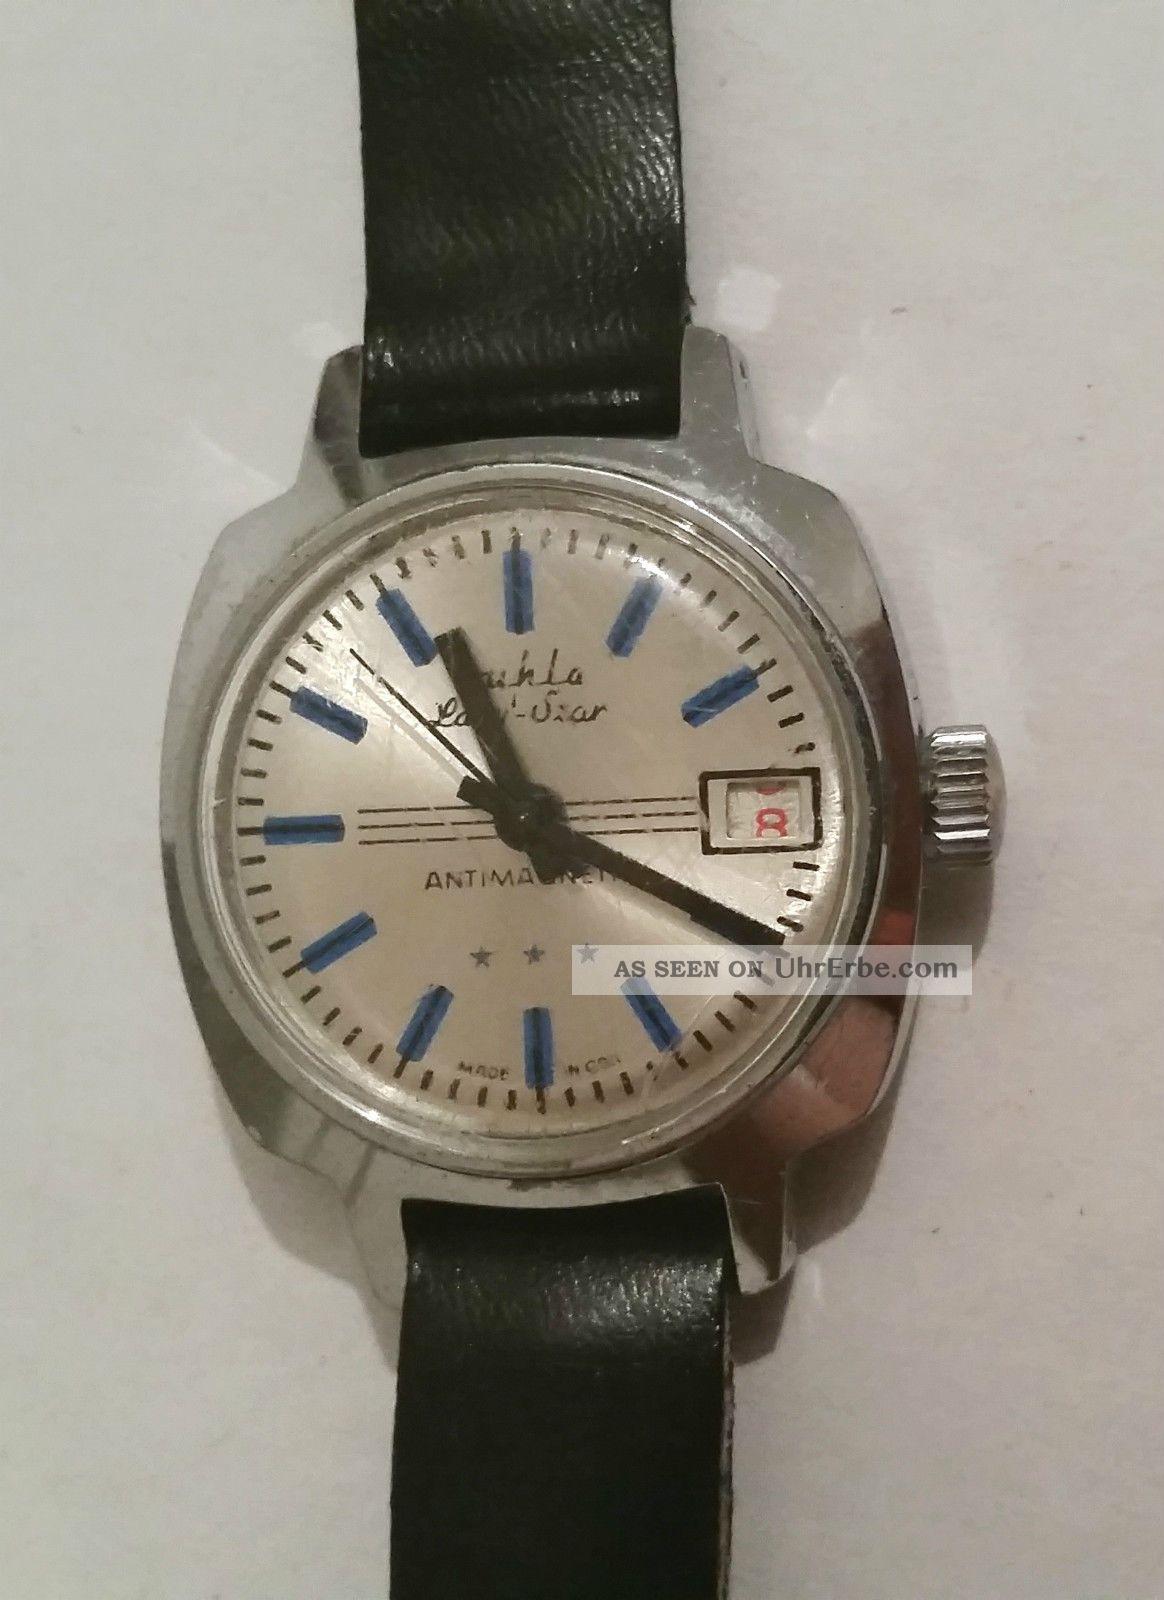 Ruhla Armbanduhr Datum Handaufzug Edelstahl Antimagnetic